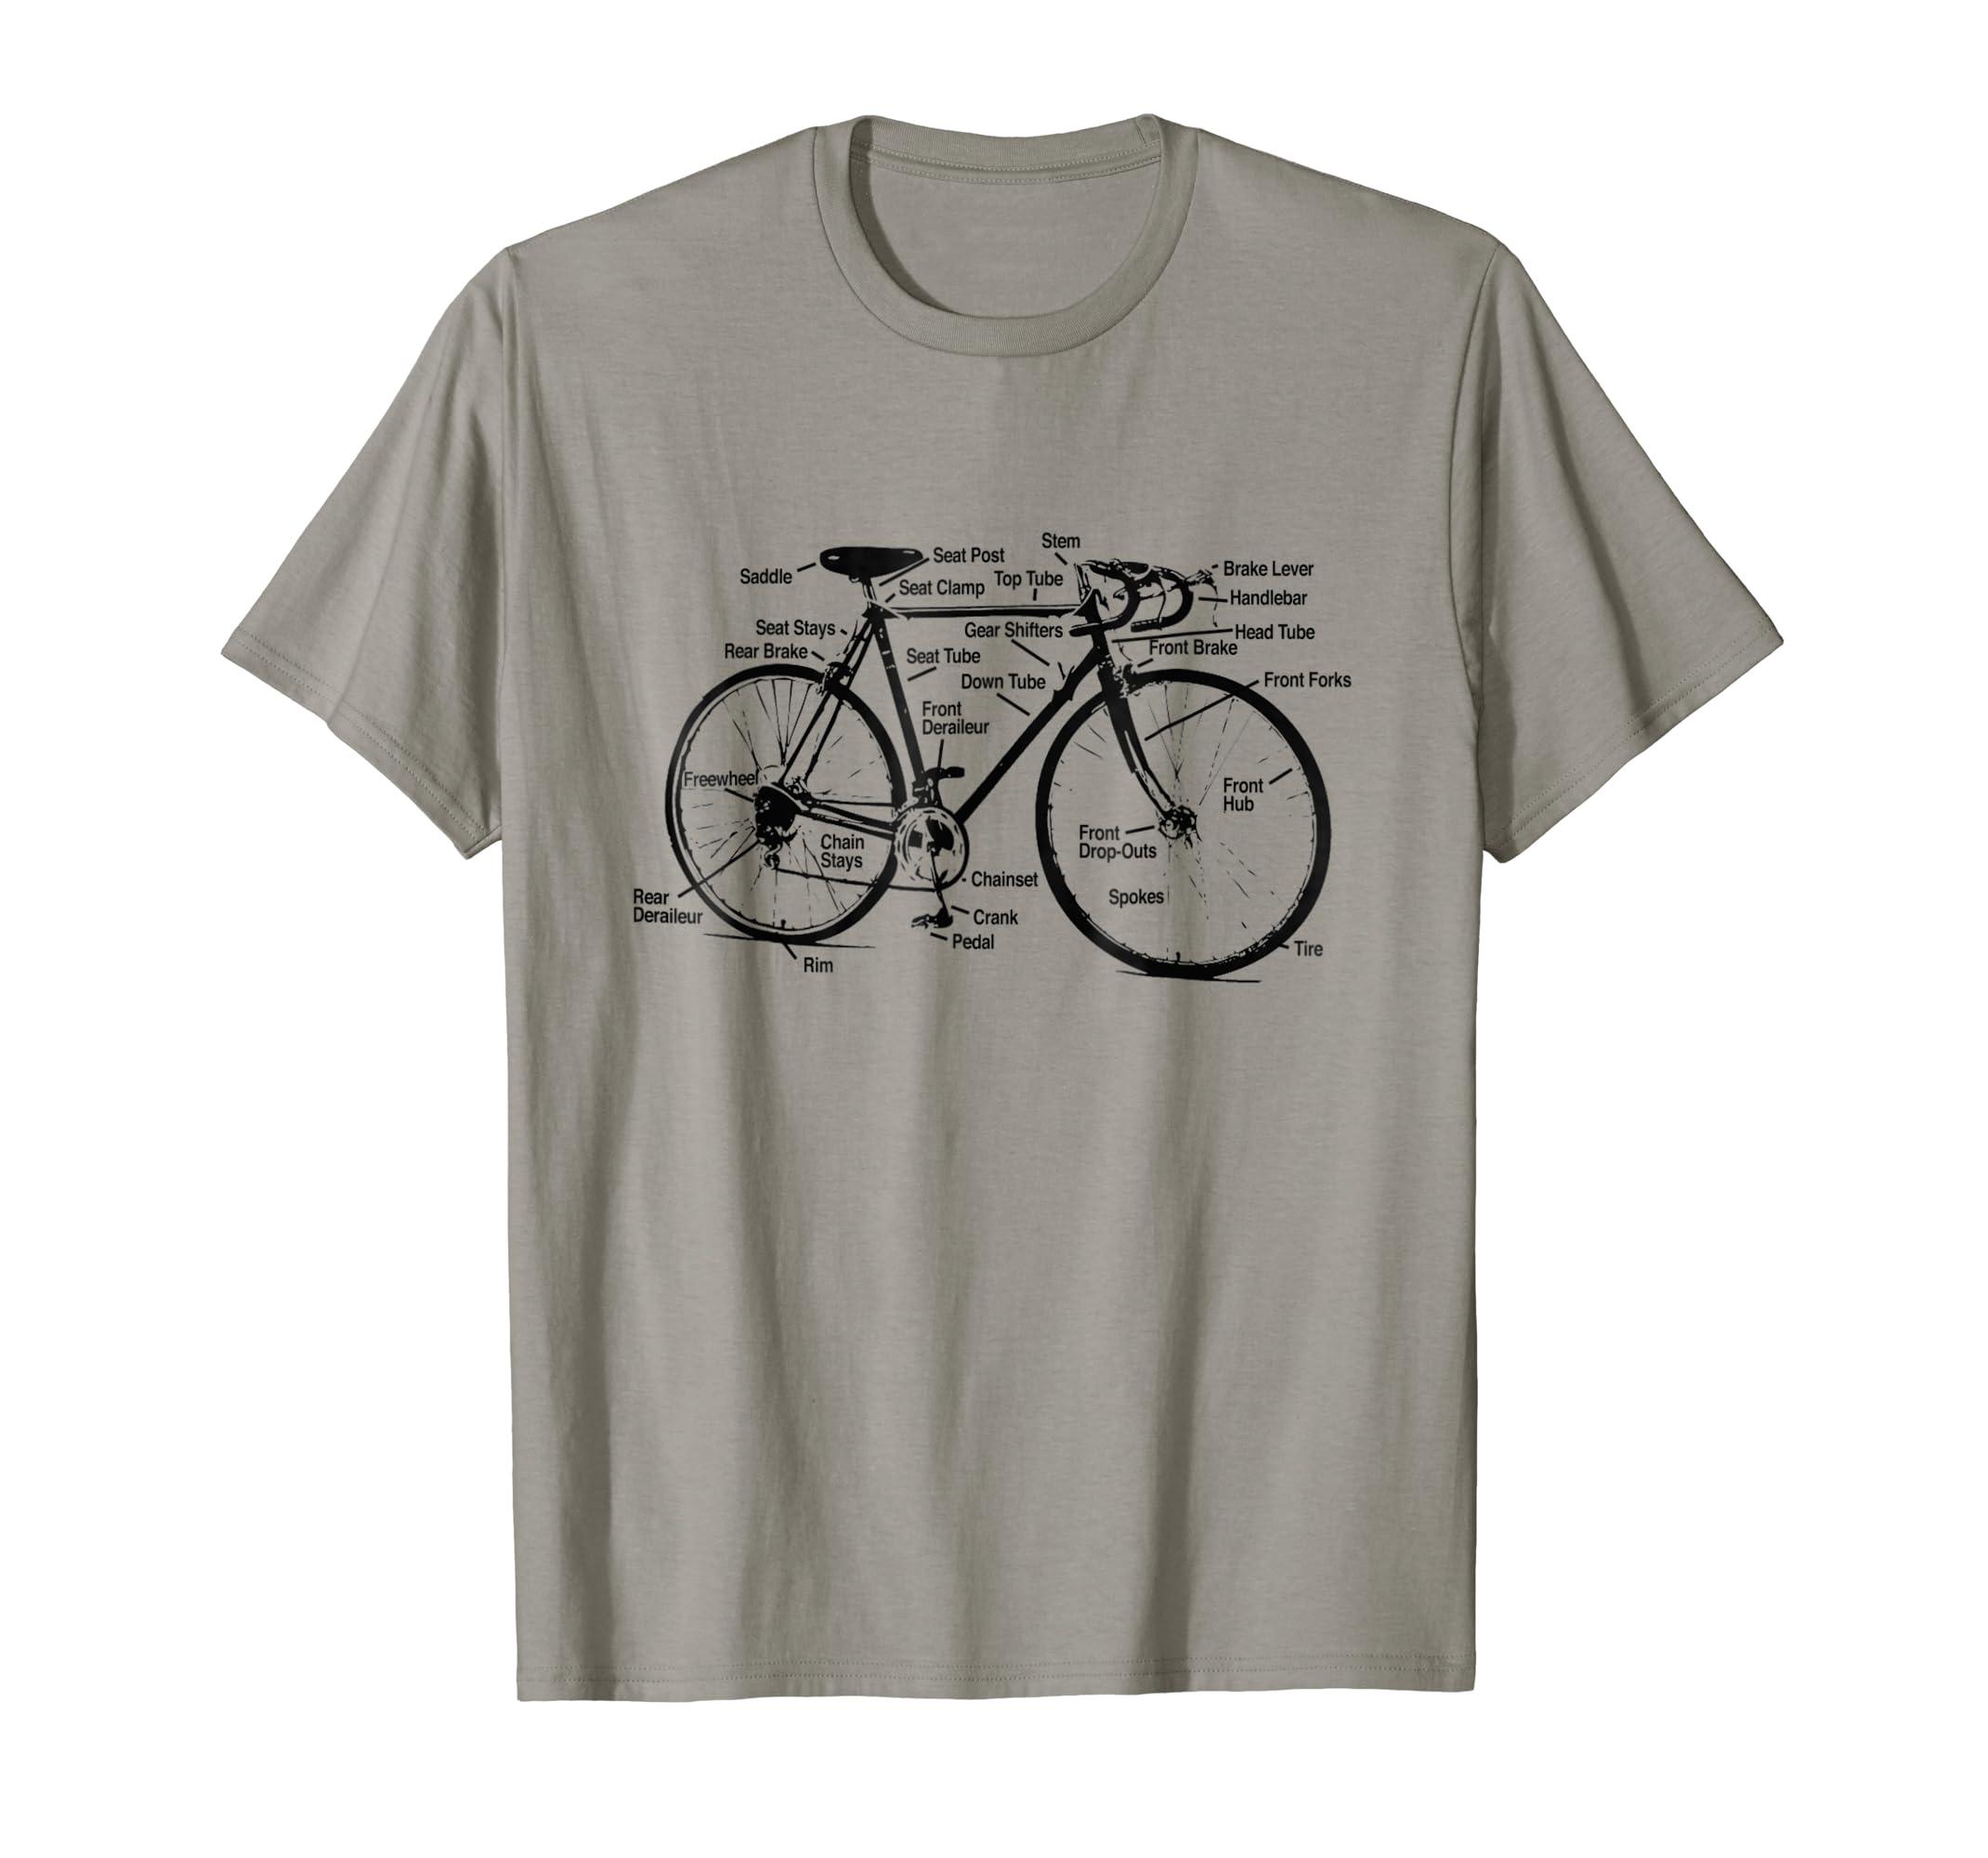 Amazon.com  Happy Family Clothing Vintage Bike Bicycle Diagram T-shirt   Clothing b0b156d58